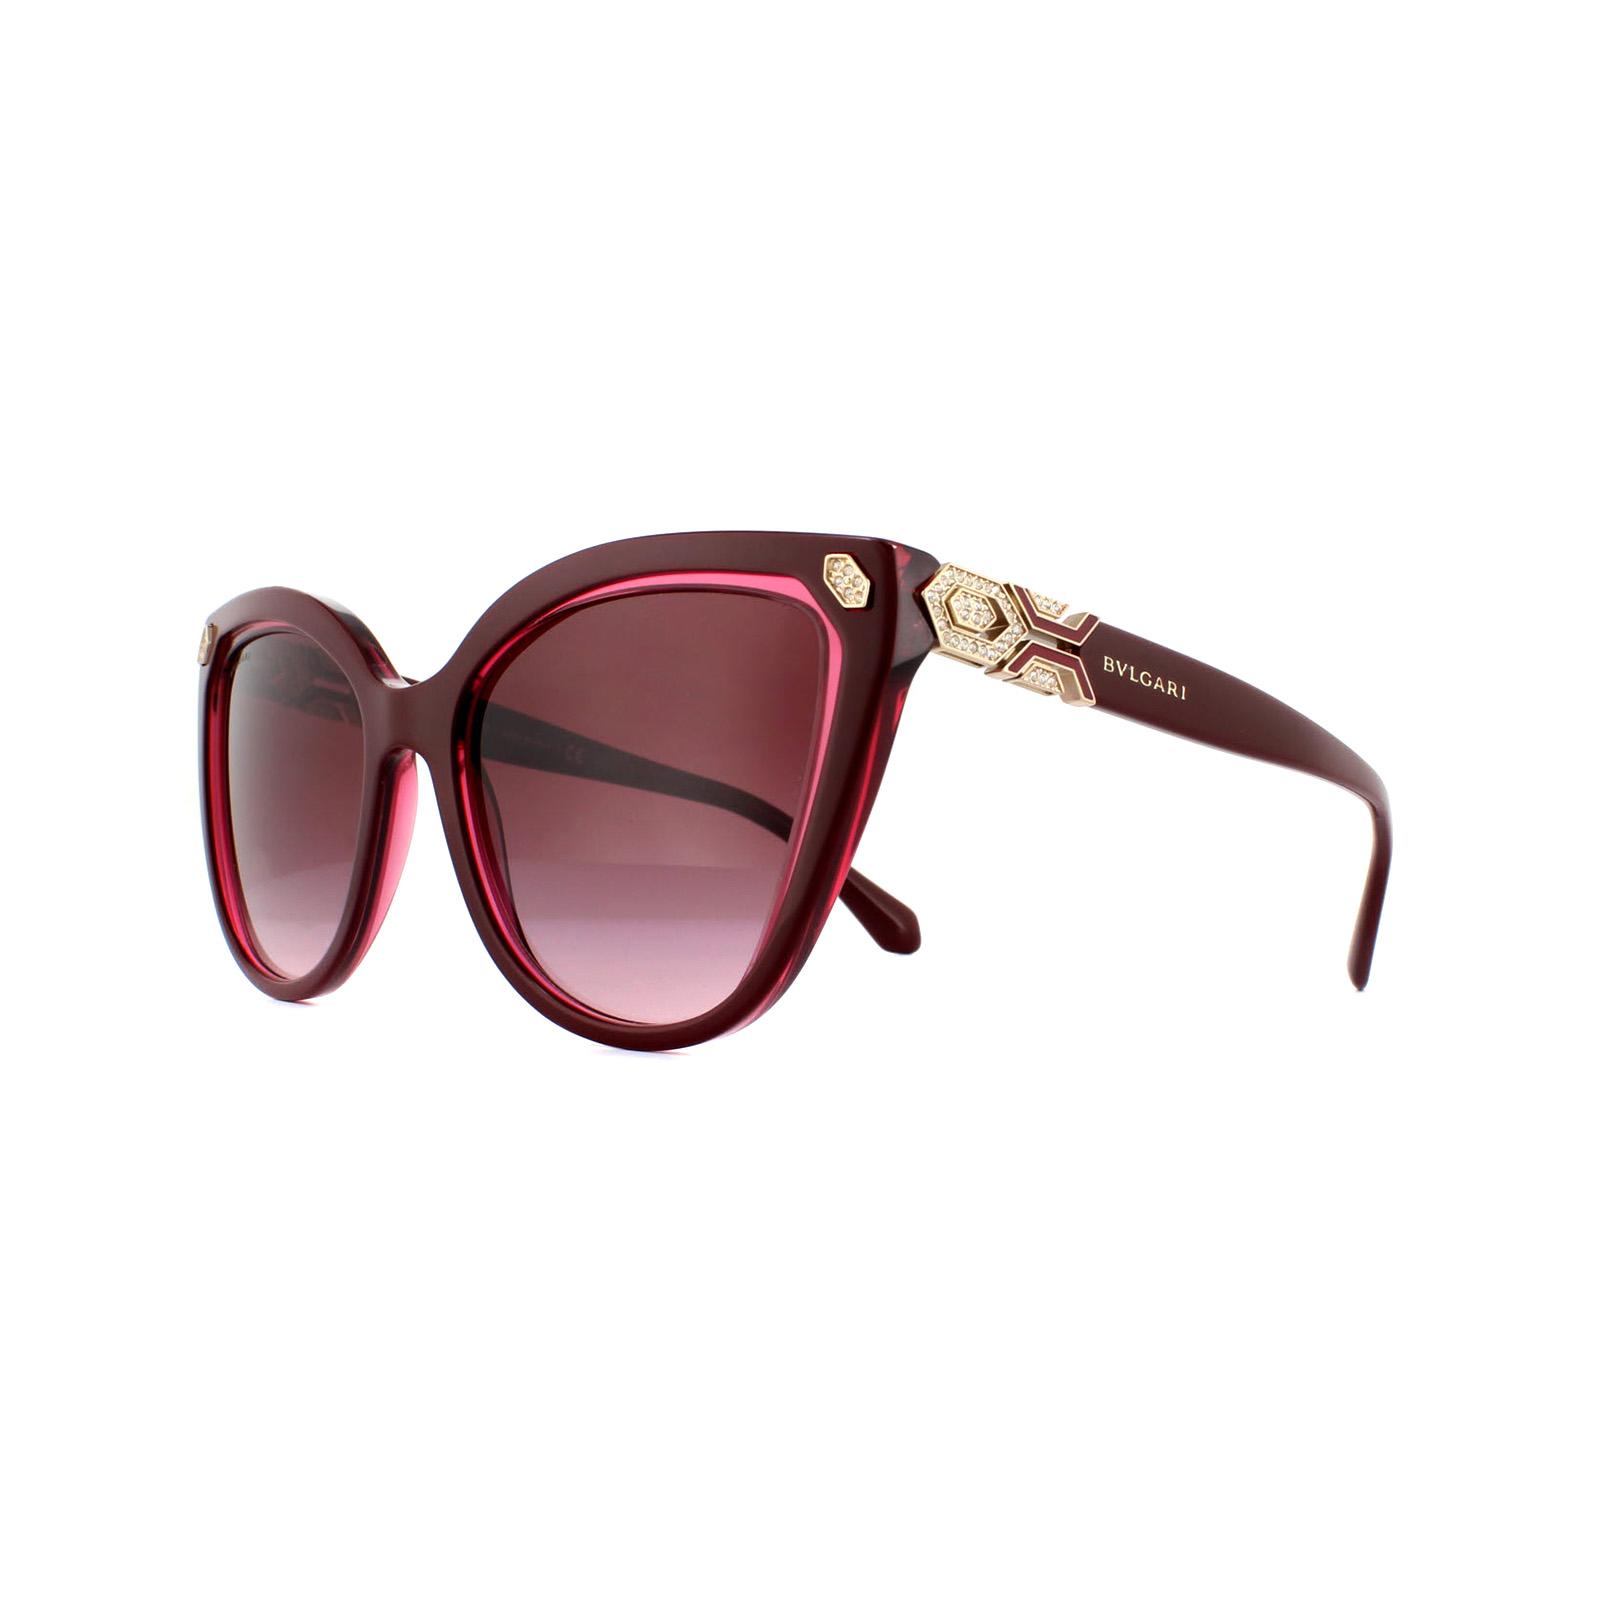 BVLGARI Sonnenbrille//Sunglasses  8136-B 5318//14  57 15 17  140 2N    //219